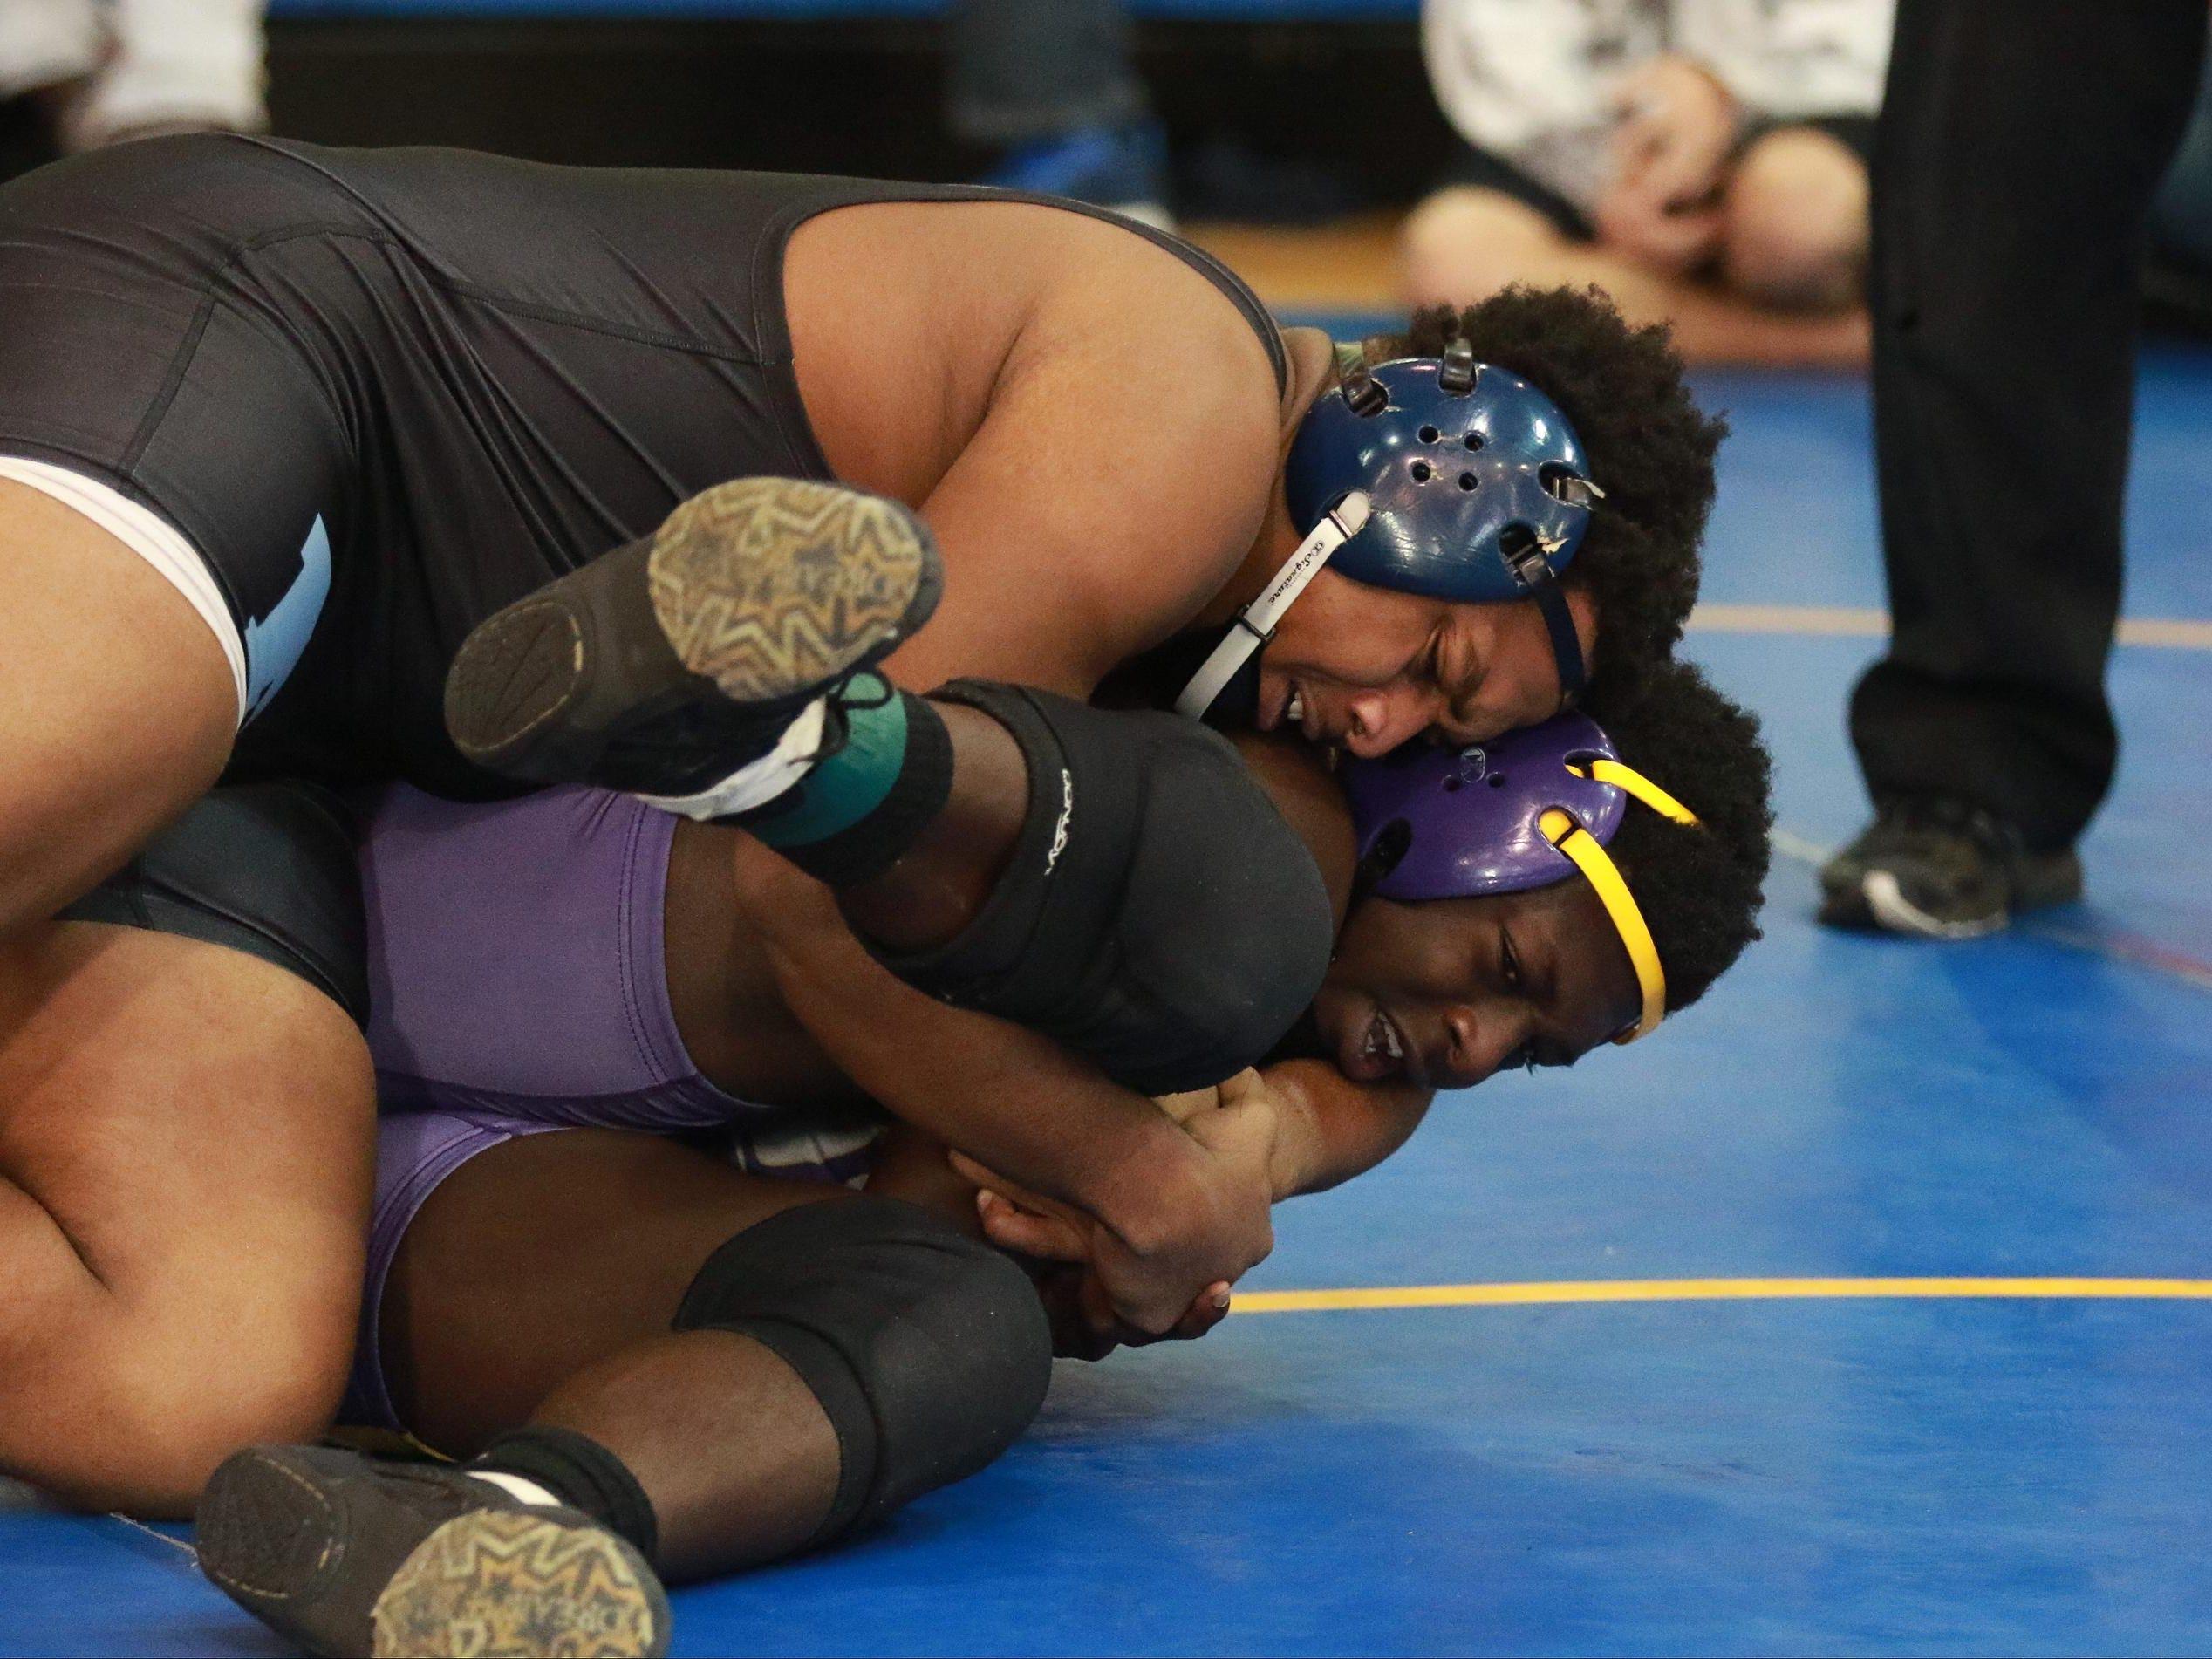 JL Man's Raitavius Whitner placed third in the Eastside Southern Slam Wrestling tournament Saturday.